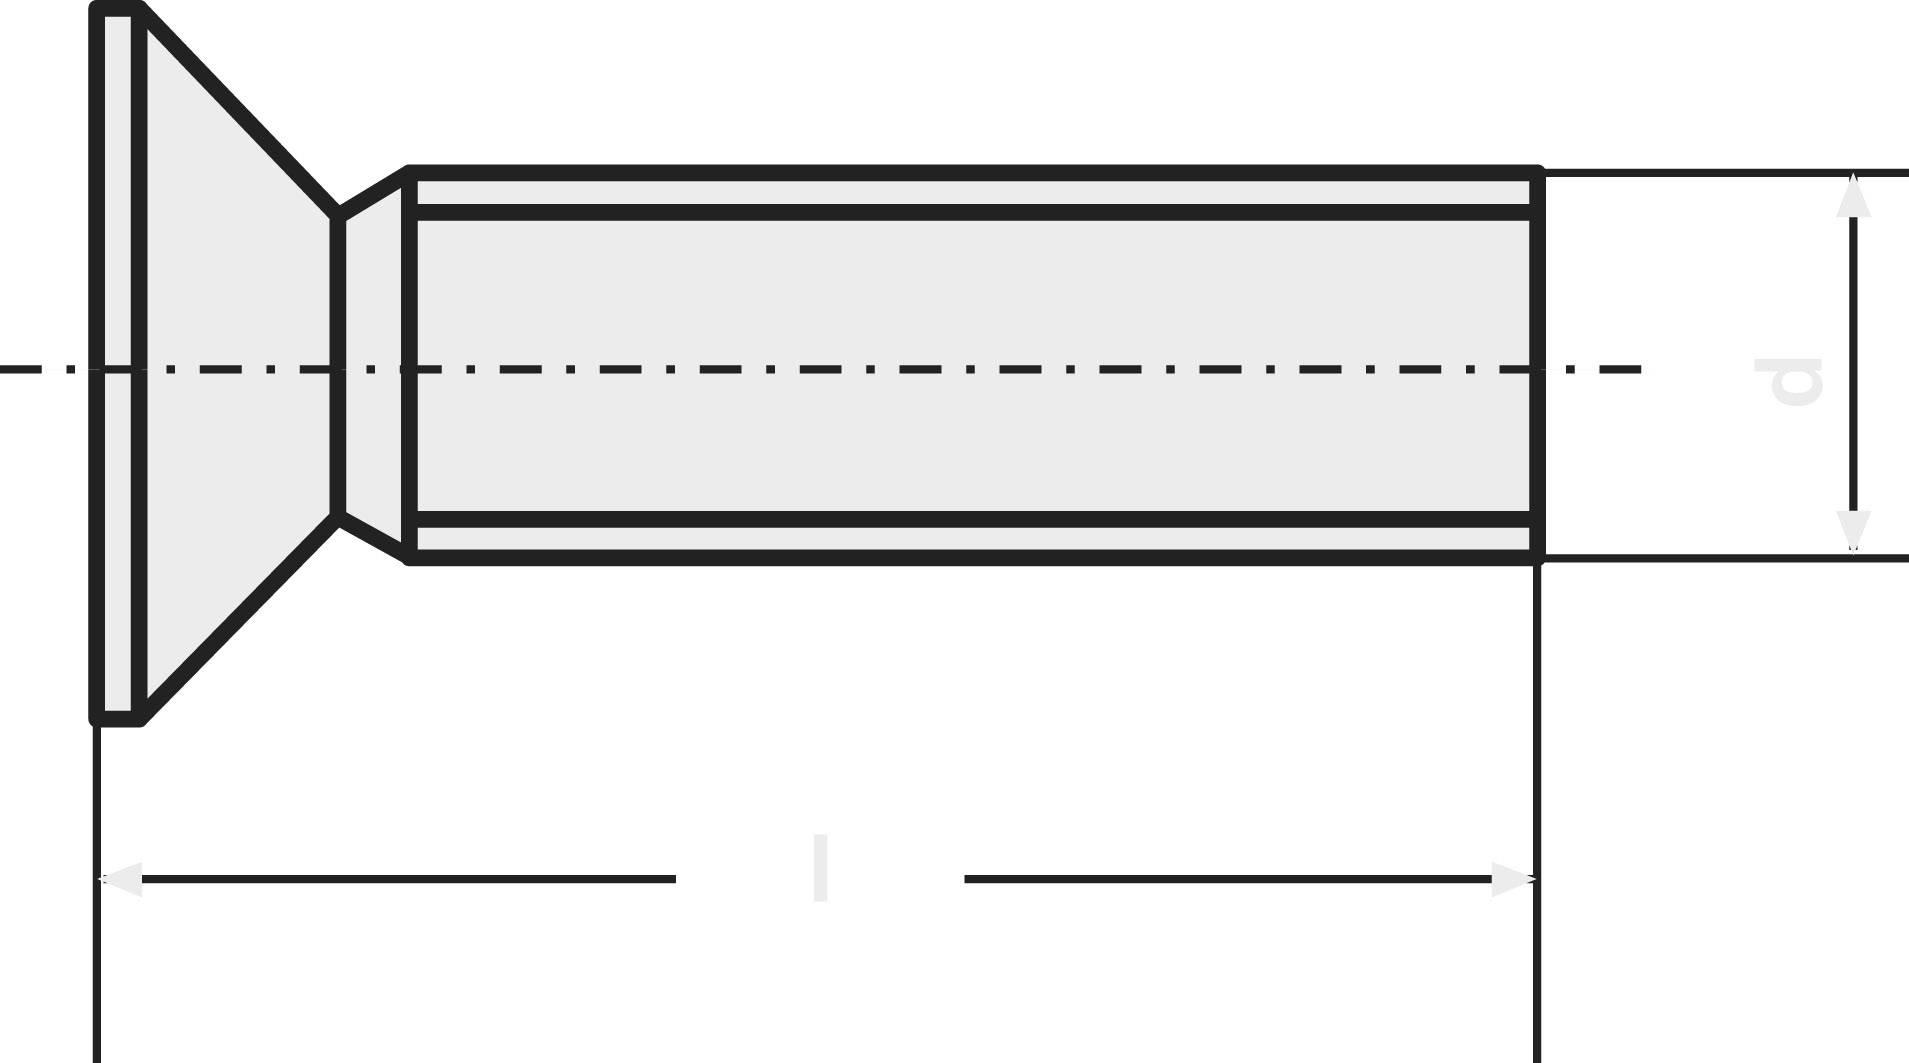 Zápustný šroub TOOLCRAFT 839909, Torx, M2,5, DIN 965, 6 mm, ušlechtilá ocel, 20 ks